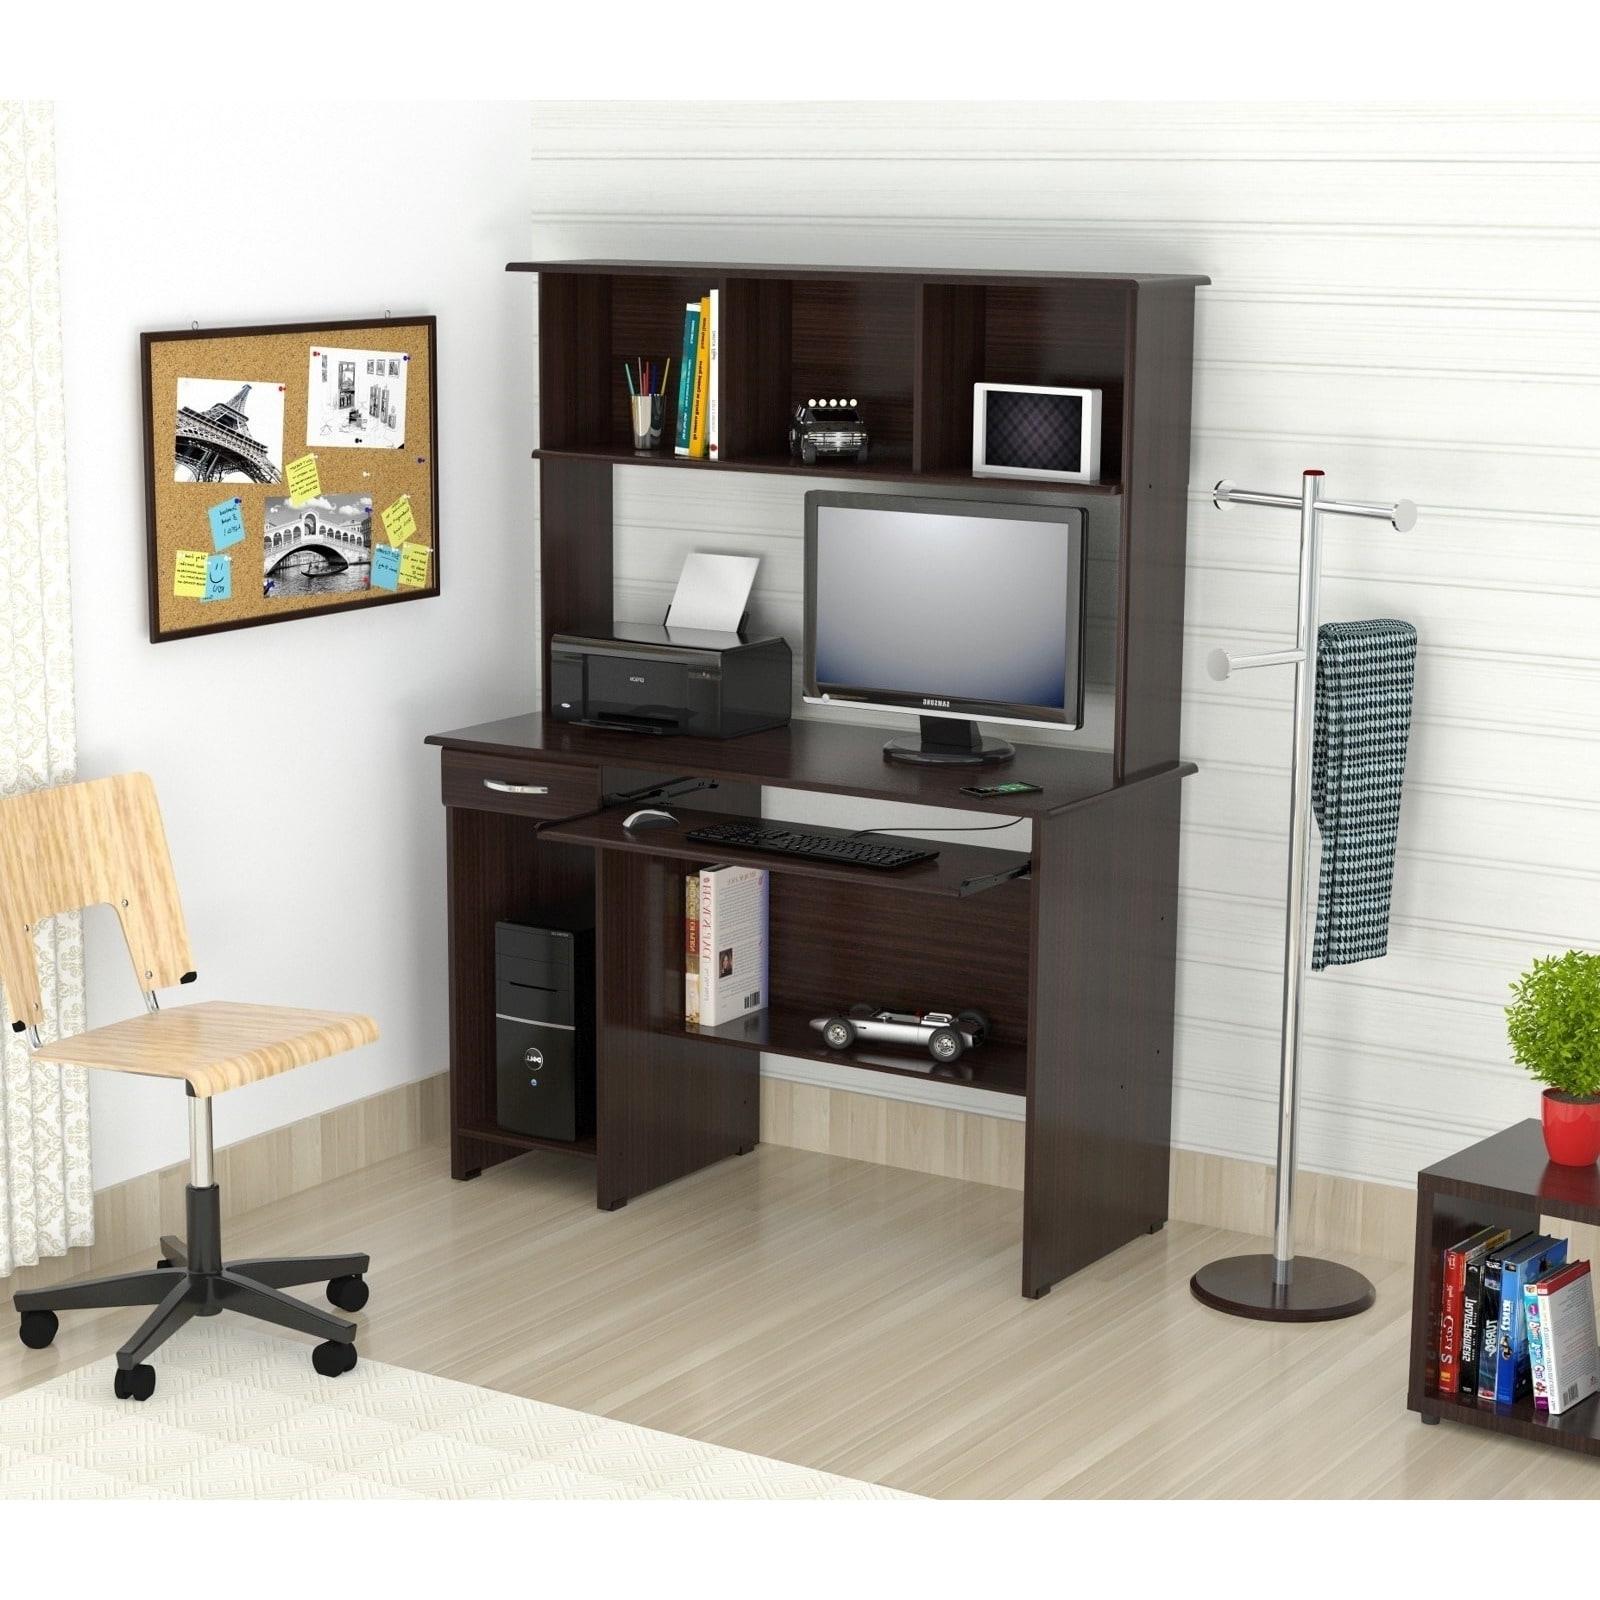 Most Popular Inval Espresso Wenge Computer Work Center With Hutch – Free Throughout Espresso Computer Desks (View 5 of 20)